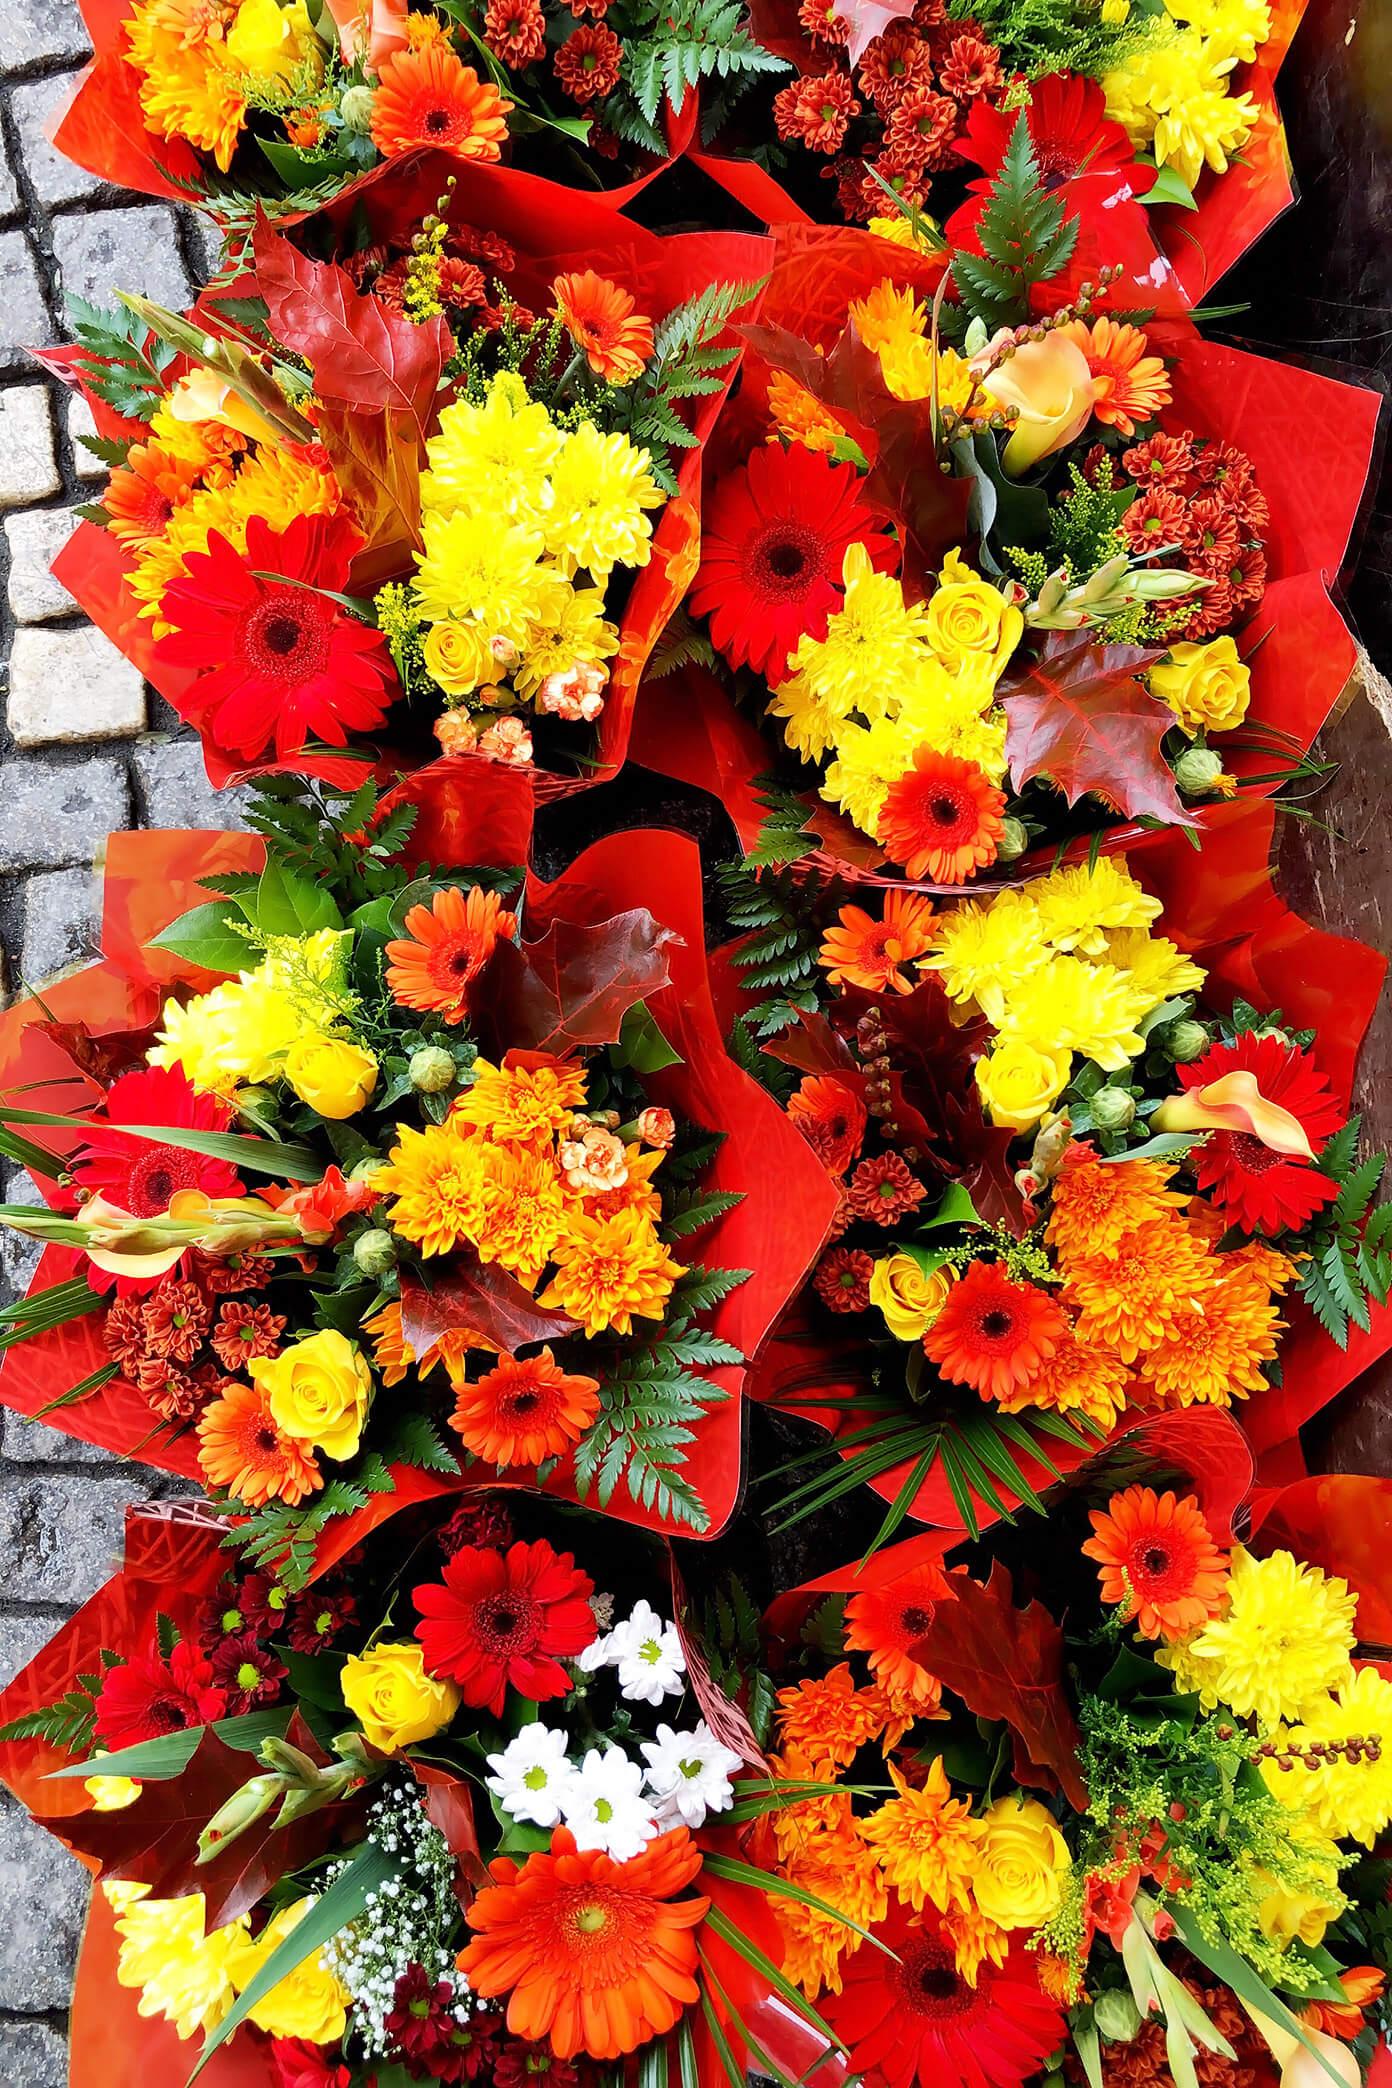 Flowers in an Outdoor Market, Stockholm, Sweden